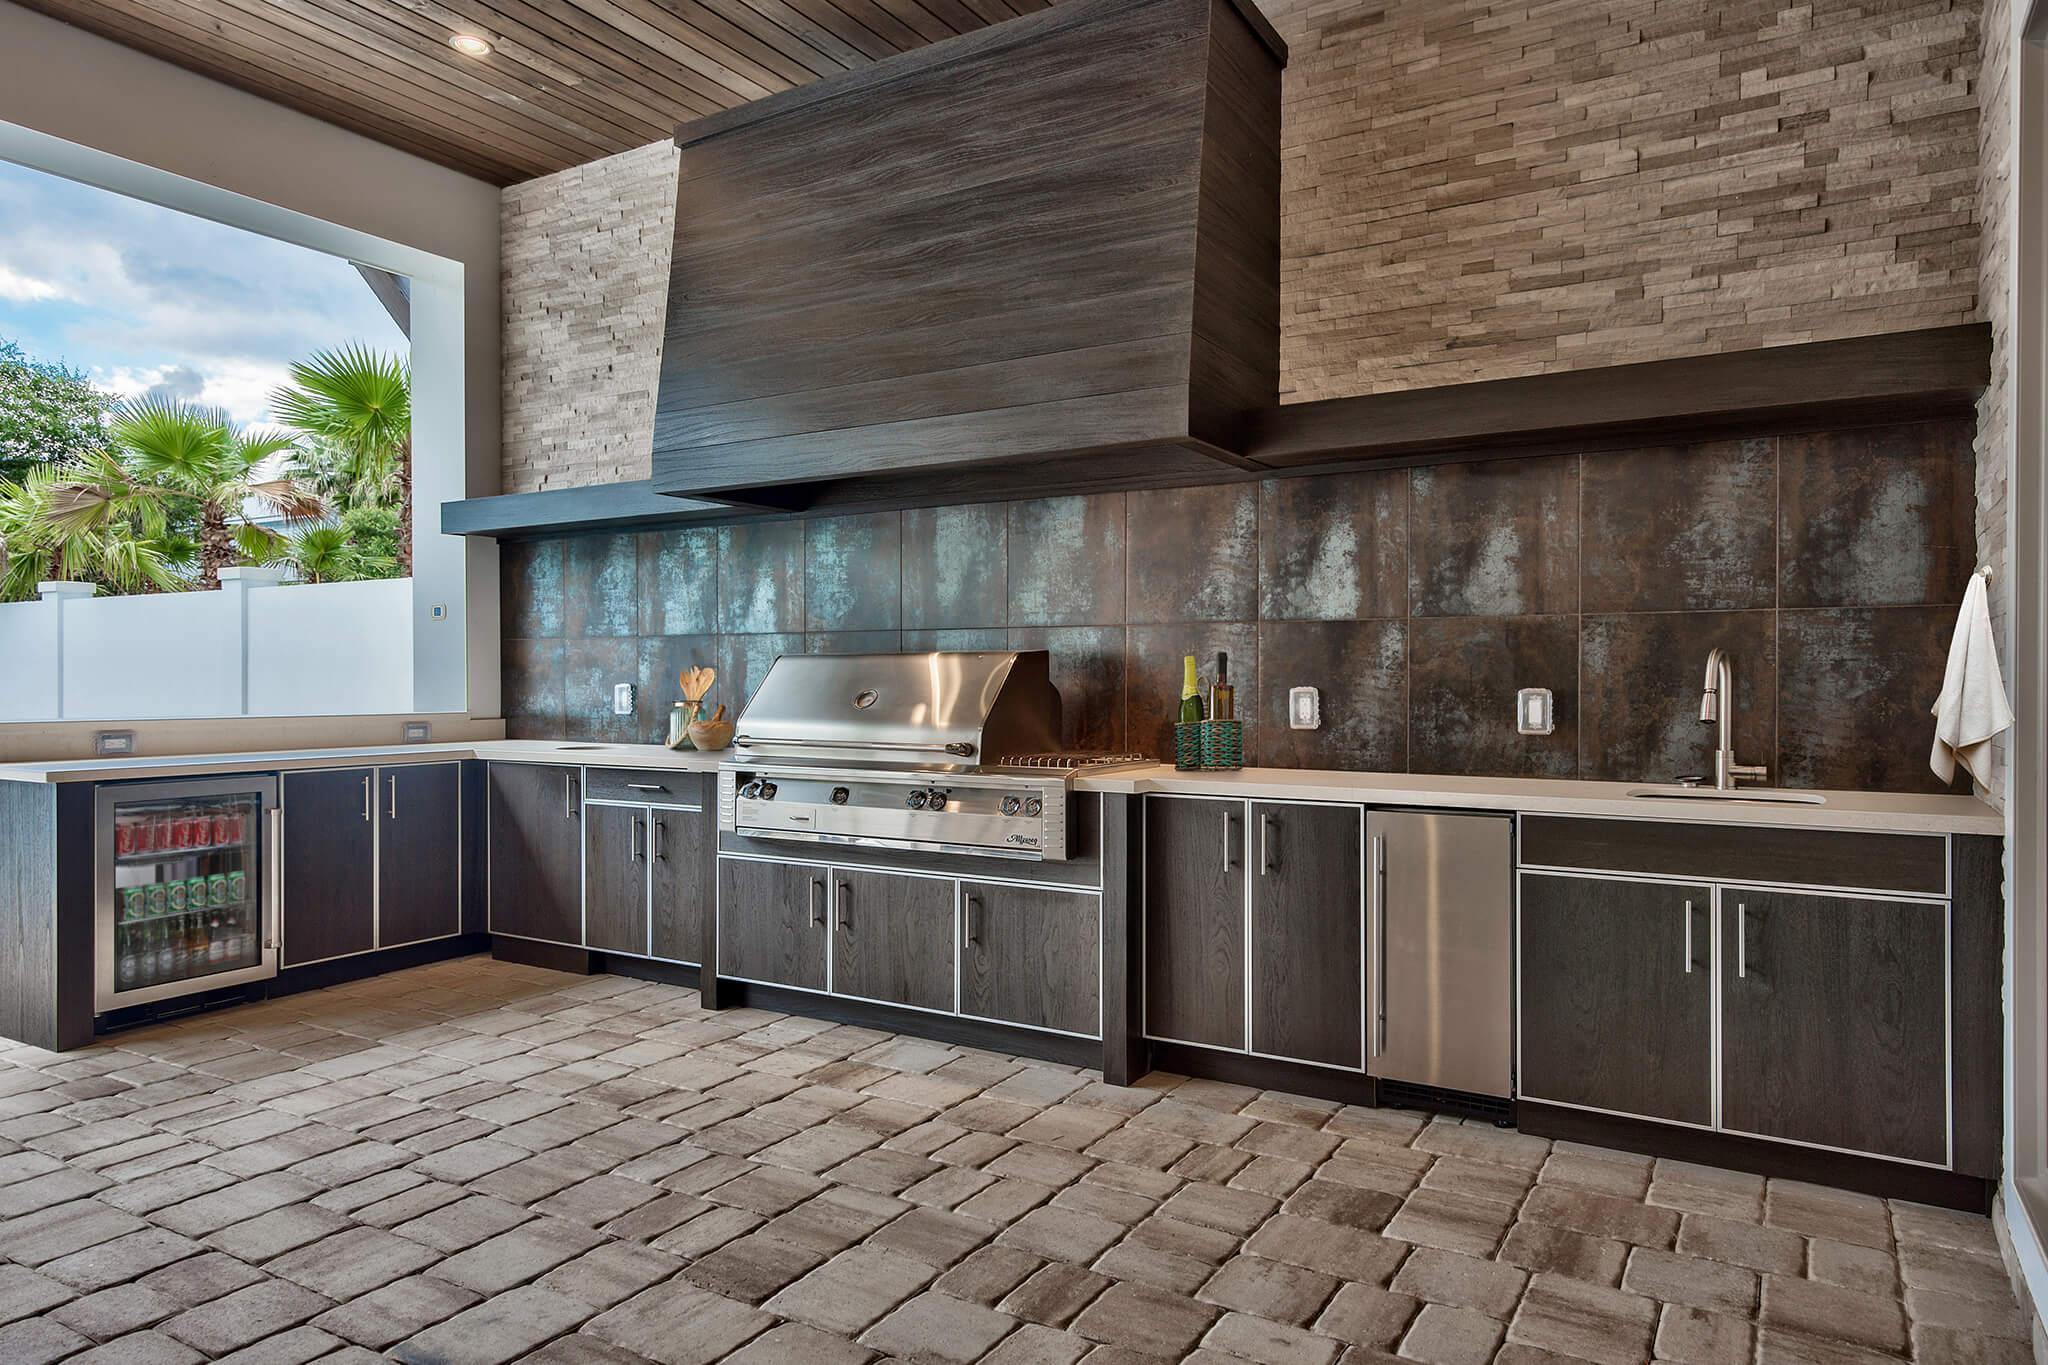 Outdoor Kitchen Design - Beck/Allen Cabinetry